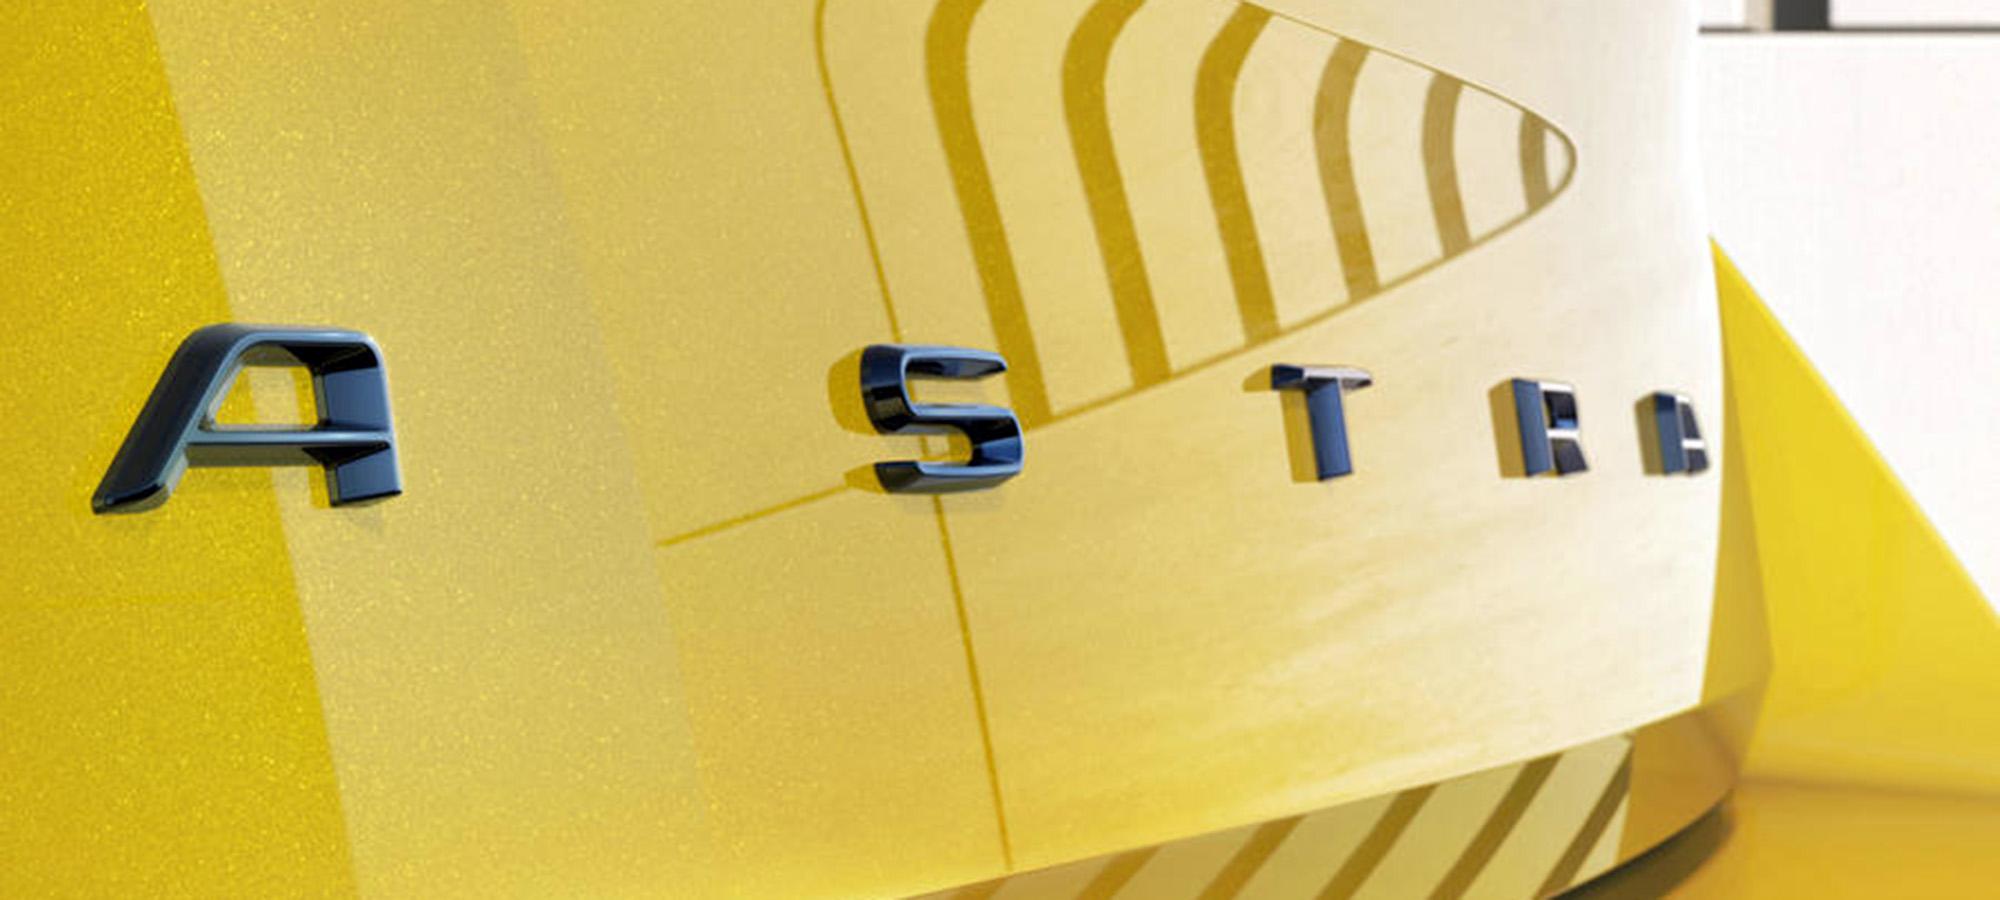 Opel: Οι πρώτες εικόνες μαρτυρούν ότι το νέο Astra δεν θυμίζει σε τίποτα το παρελθόν! (pics)